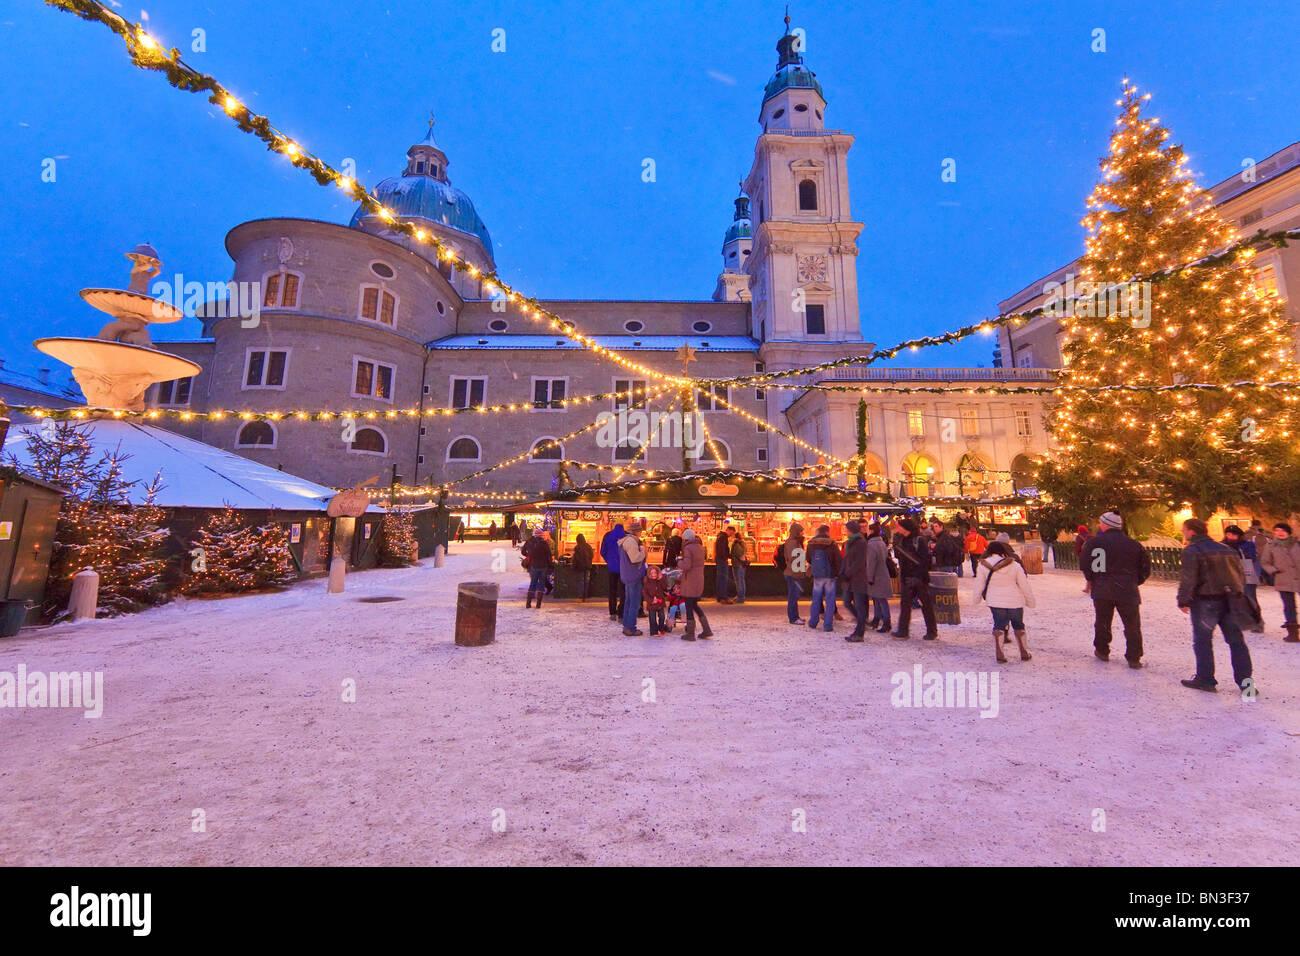 Salzburg Christmas Market.Christmas Market And Salzburg Cathedral Salzburg Austria